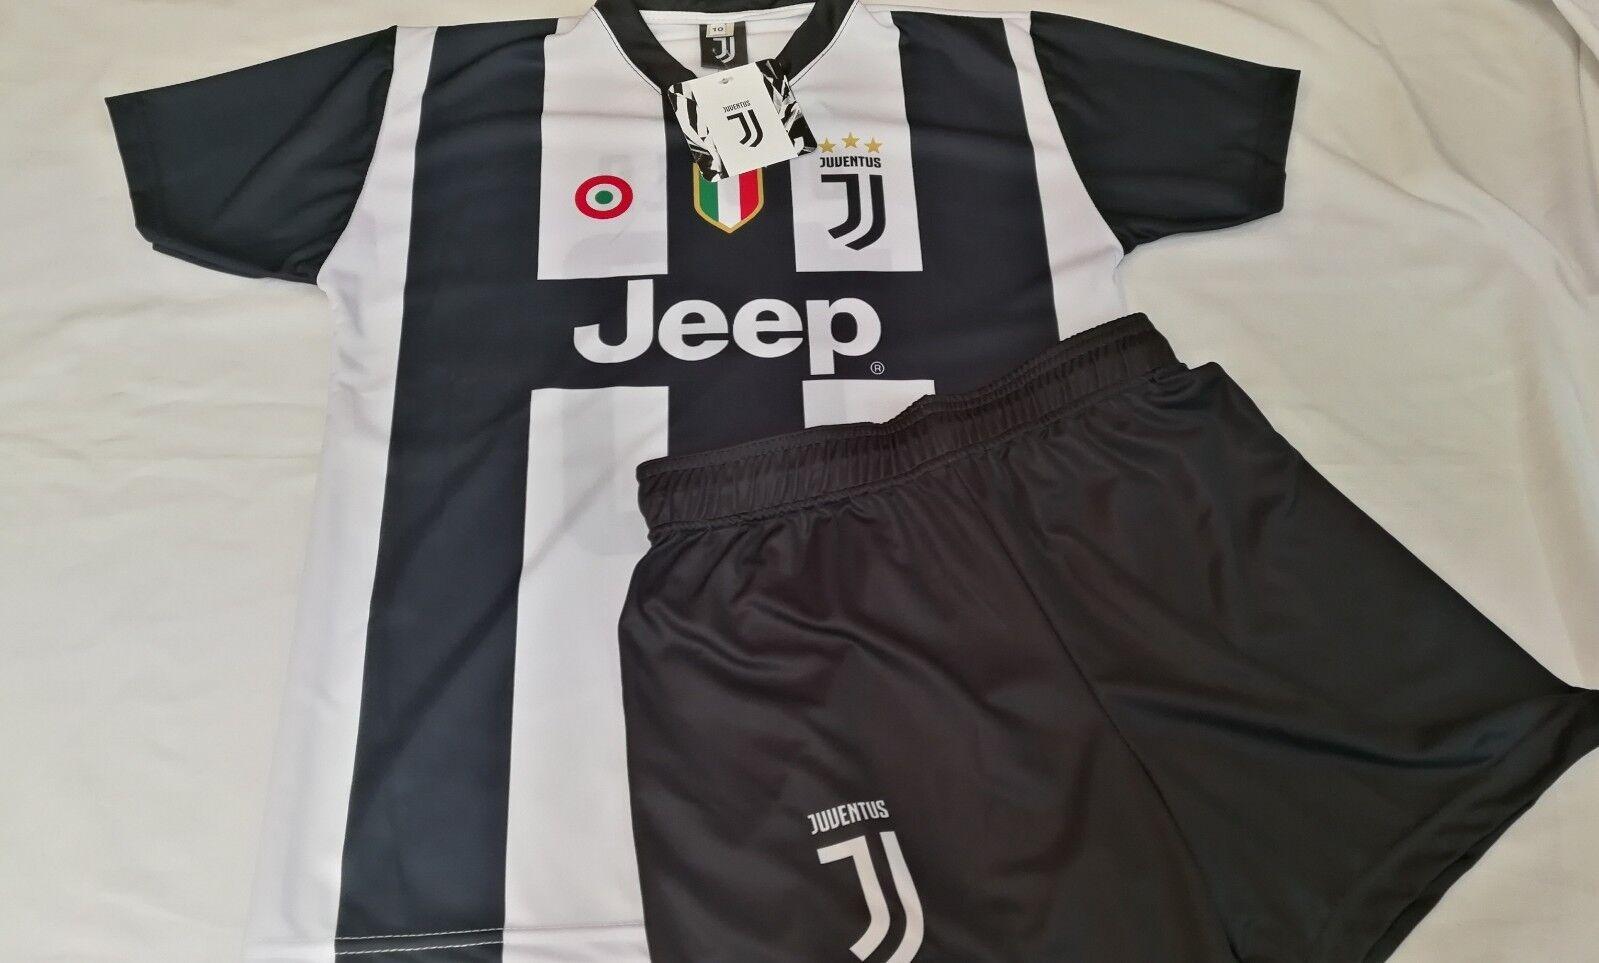 Full 2019 Taille 2 years of Emre can Juventus 2018 19 Shirt Pant juve